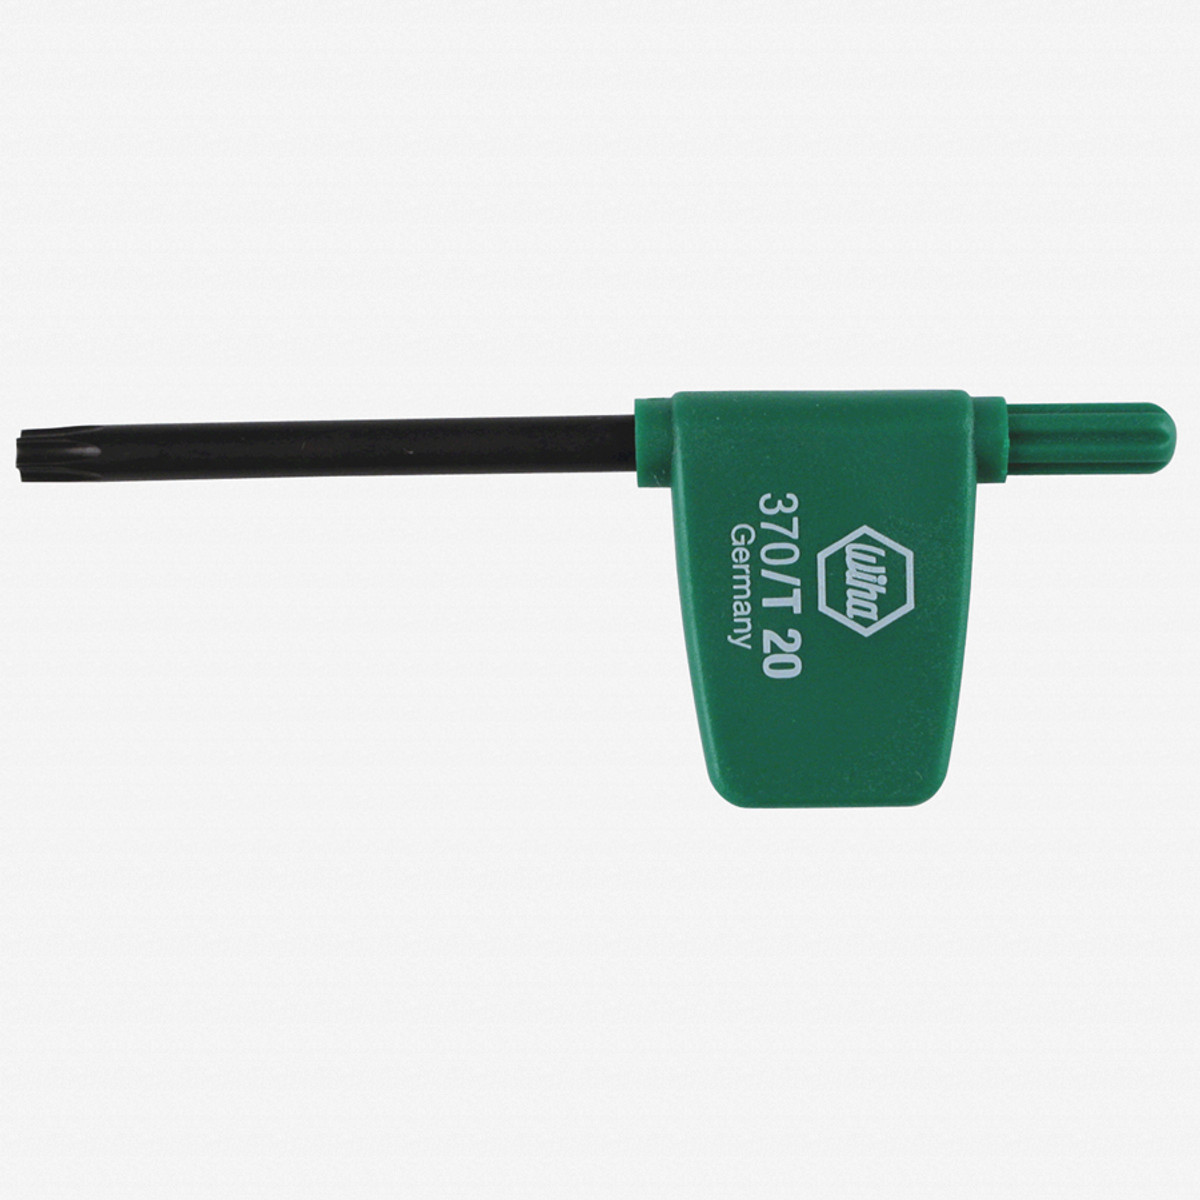 Wiha 37019 T7 x 35mm Torx Flag Handle - KC Tool